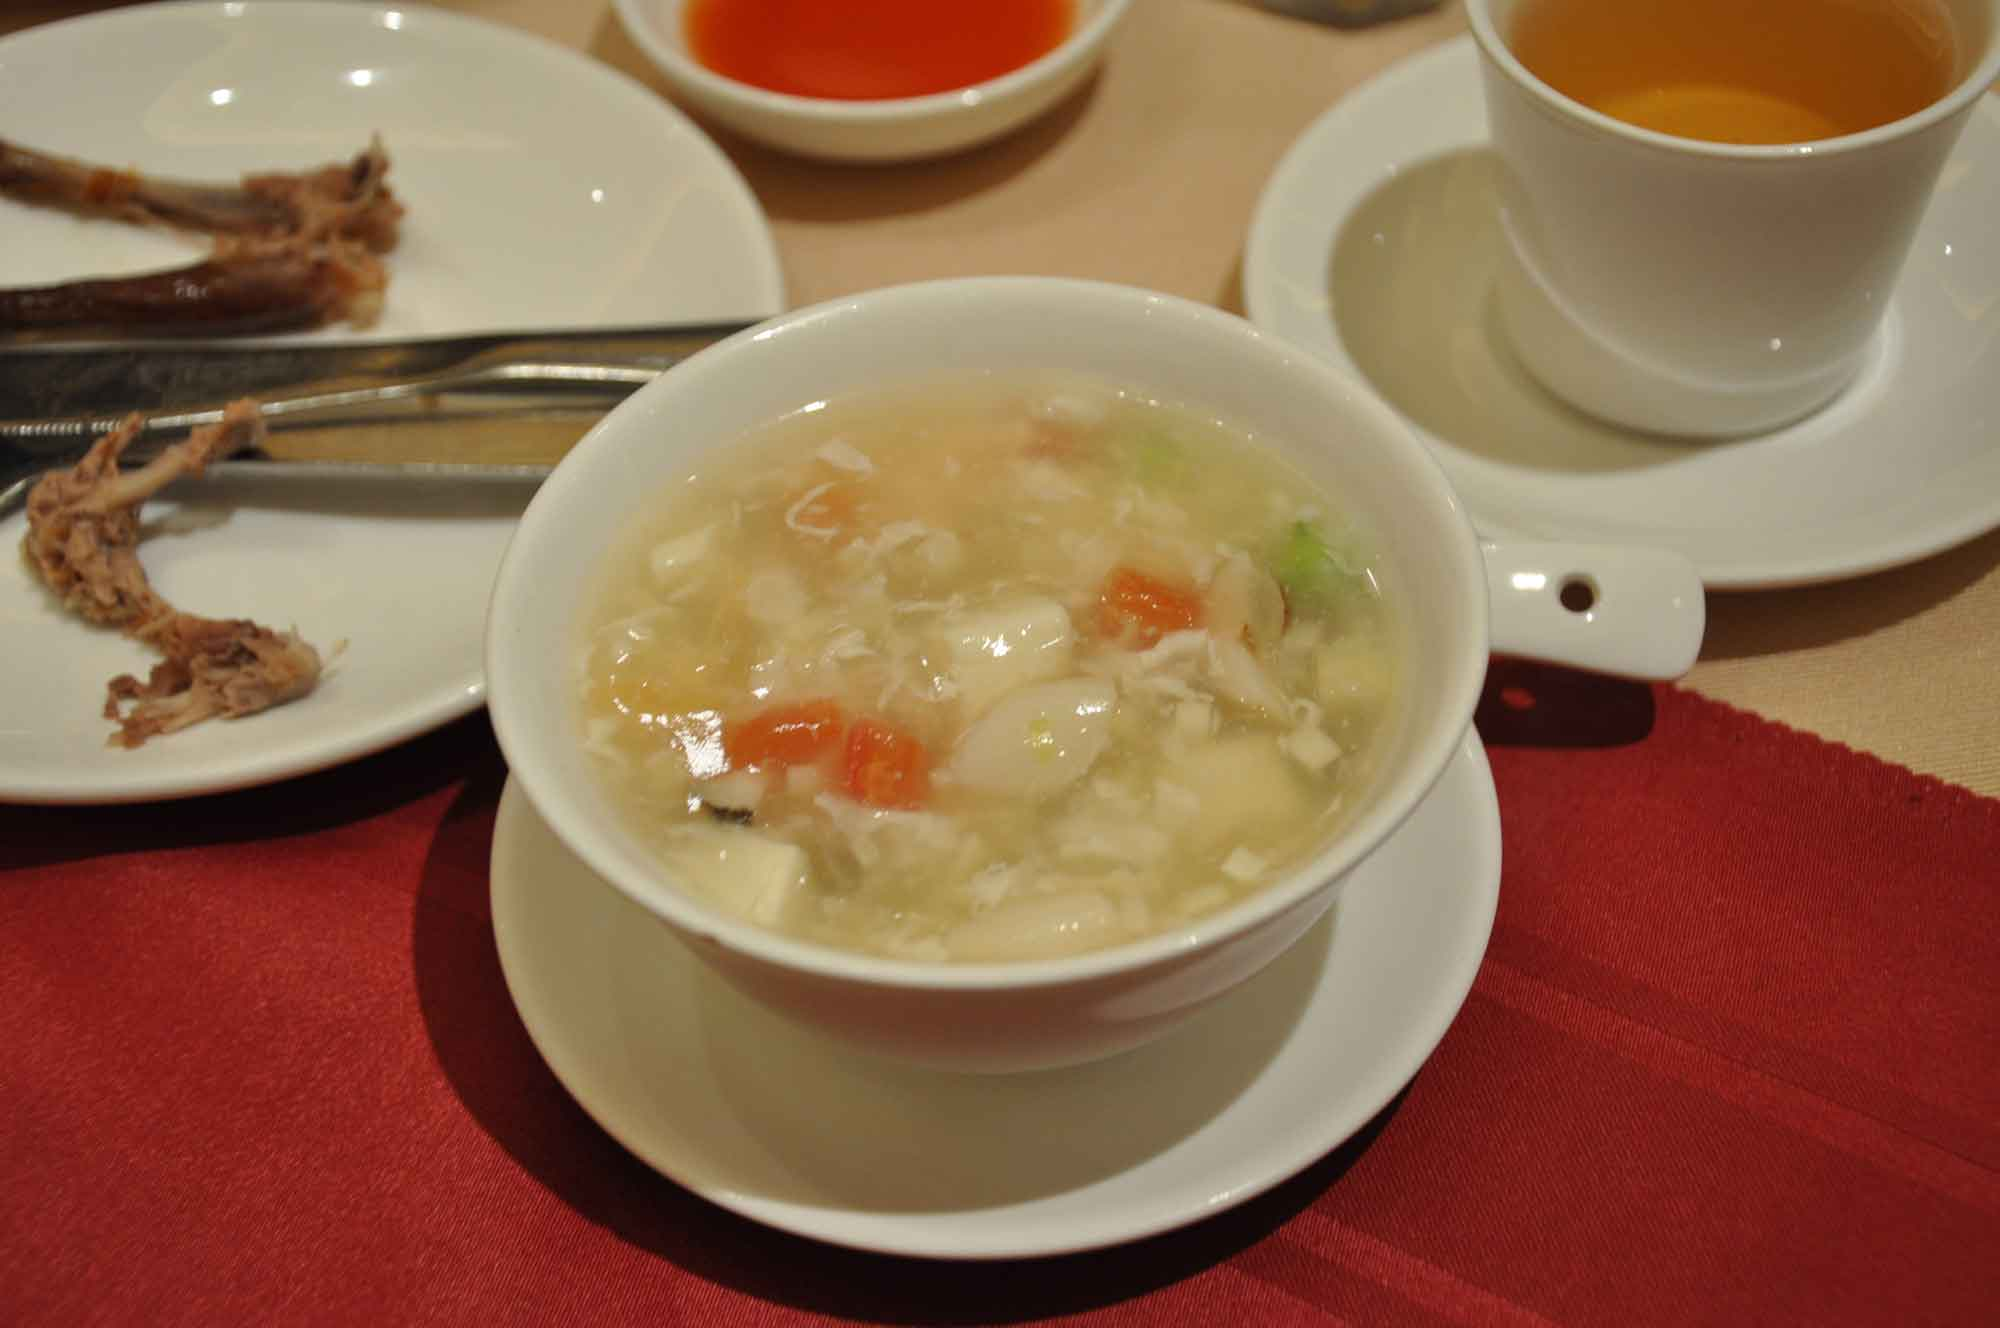 Tou Tou Koi Macau soup